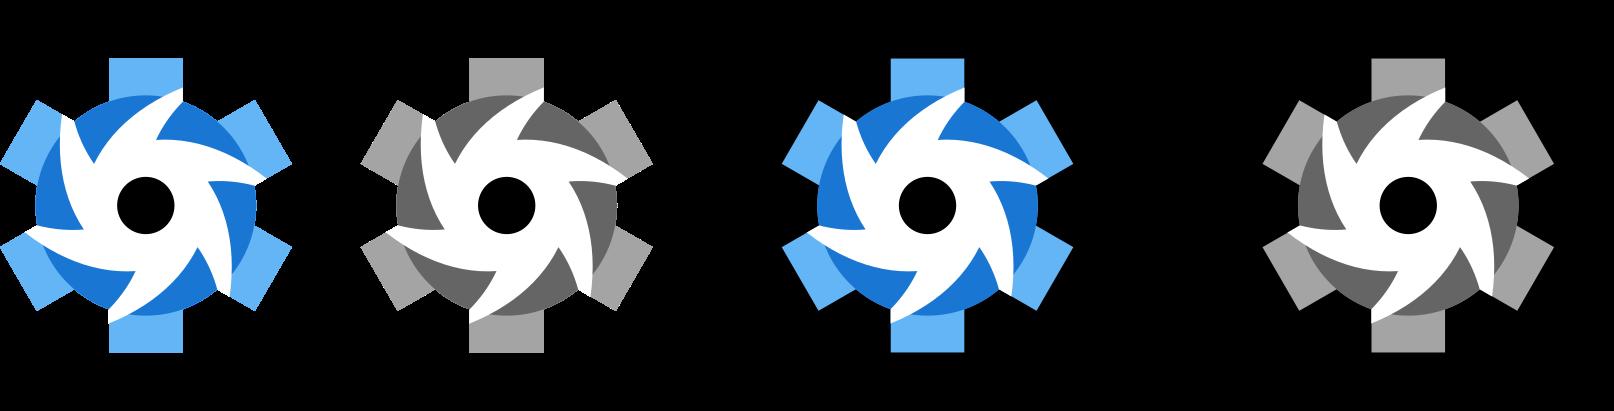 quasar-logo-3